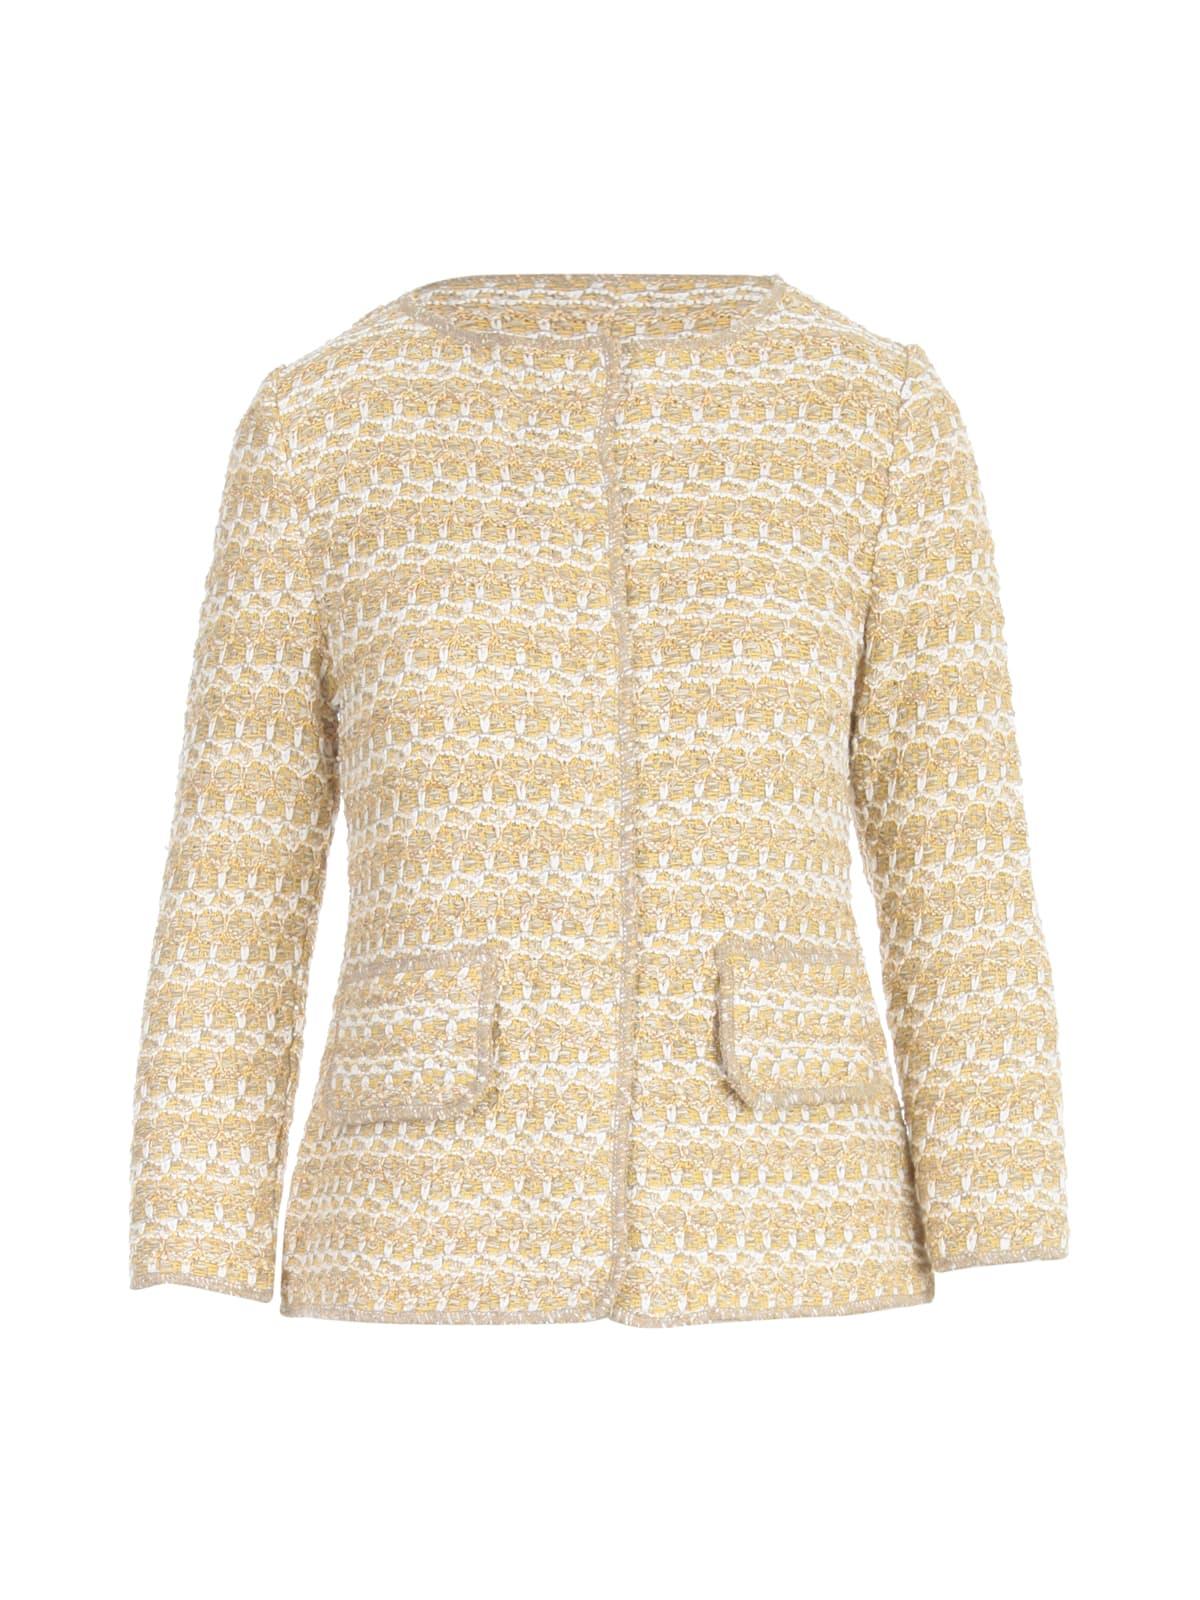 Lurex L/s Chanel Jacket